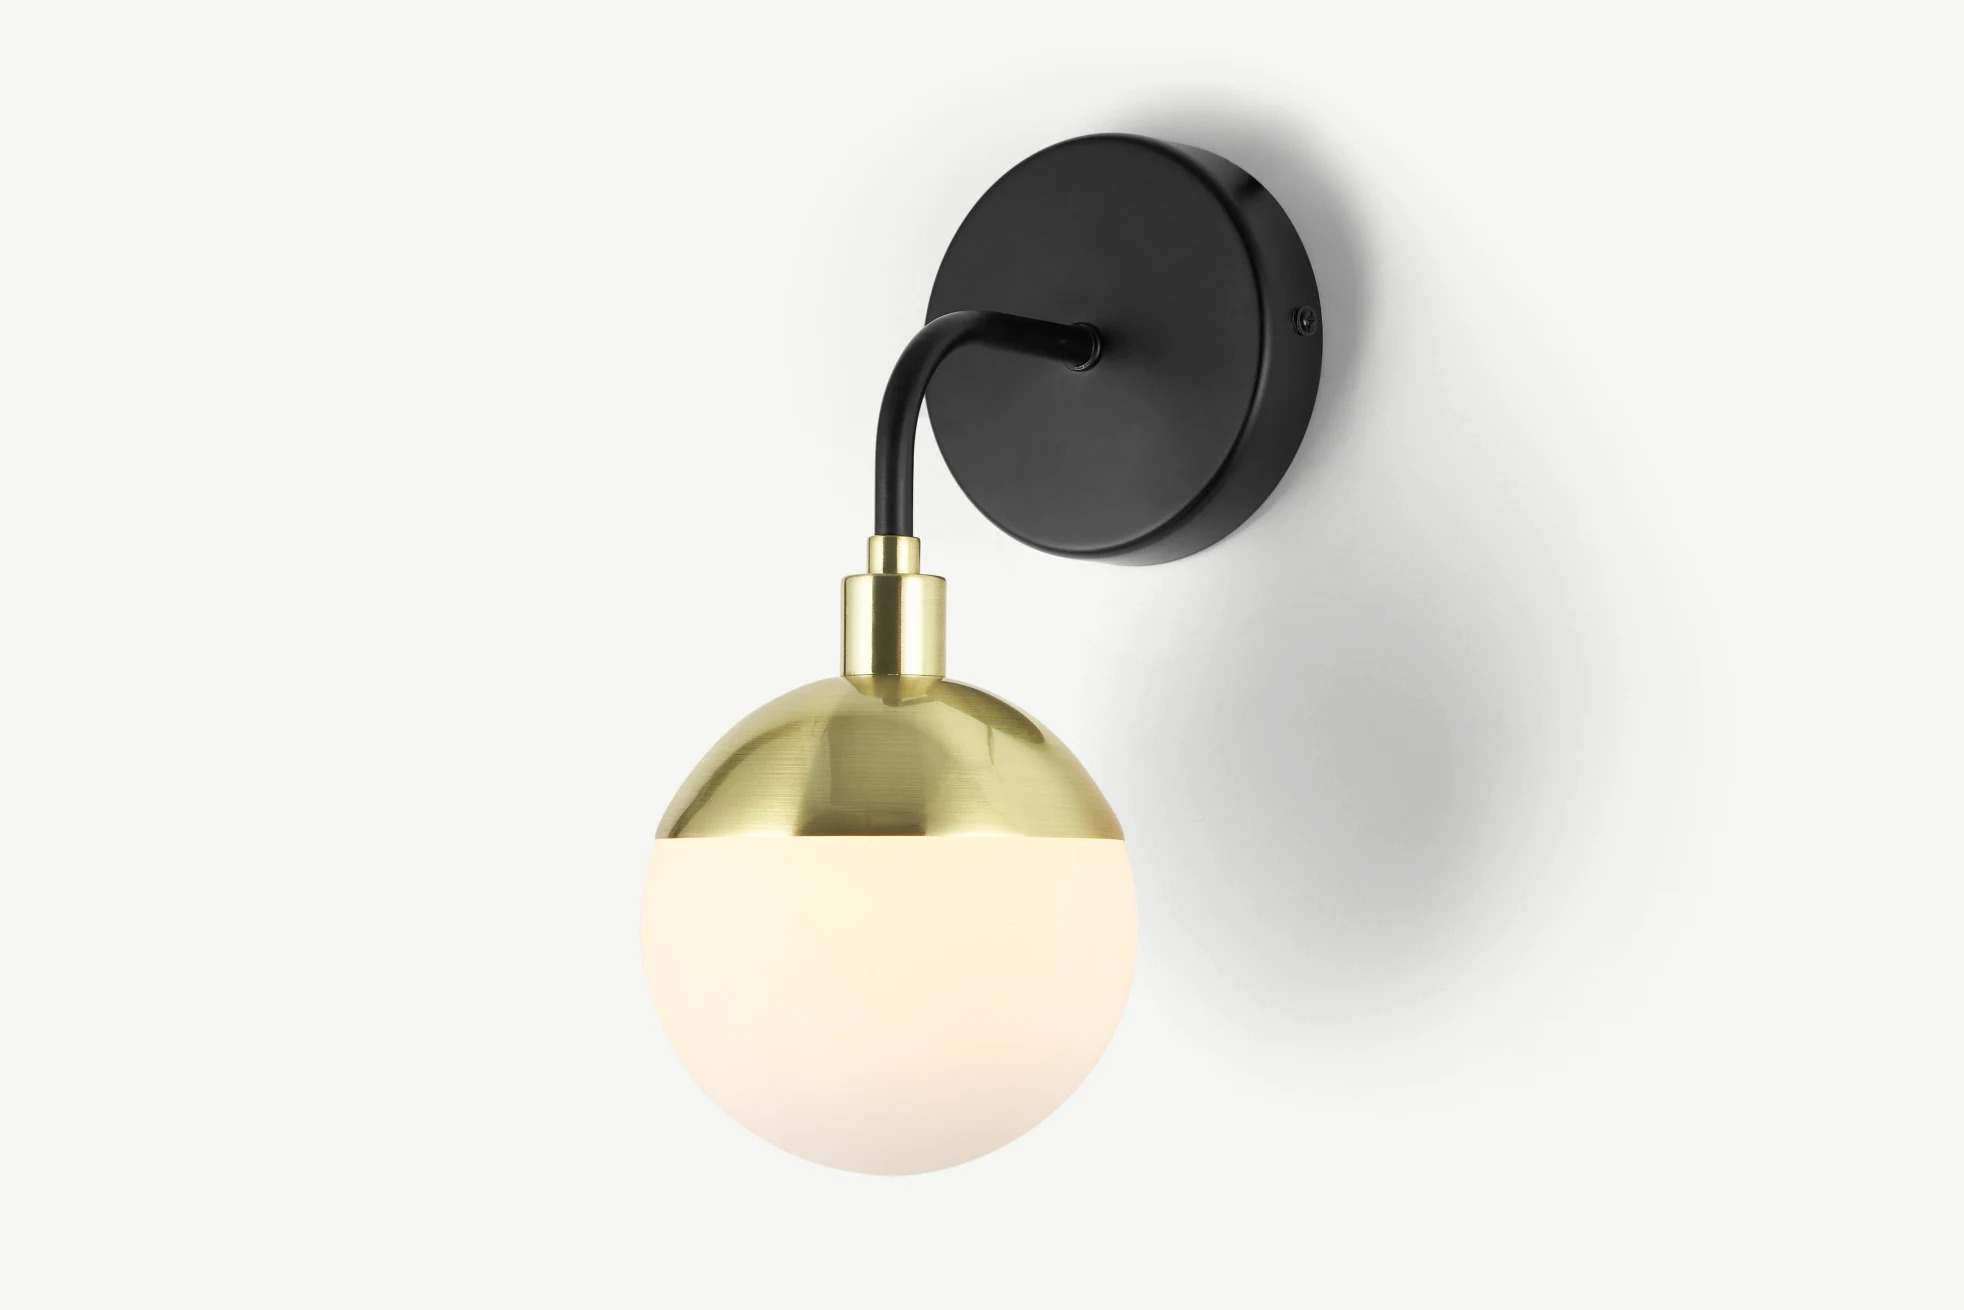 Lámpara Siren de pared para baño, negro y latón cepillado